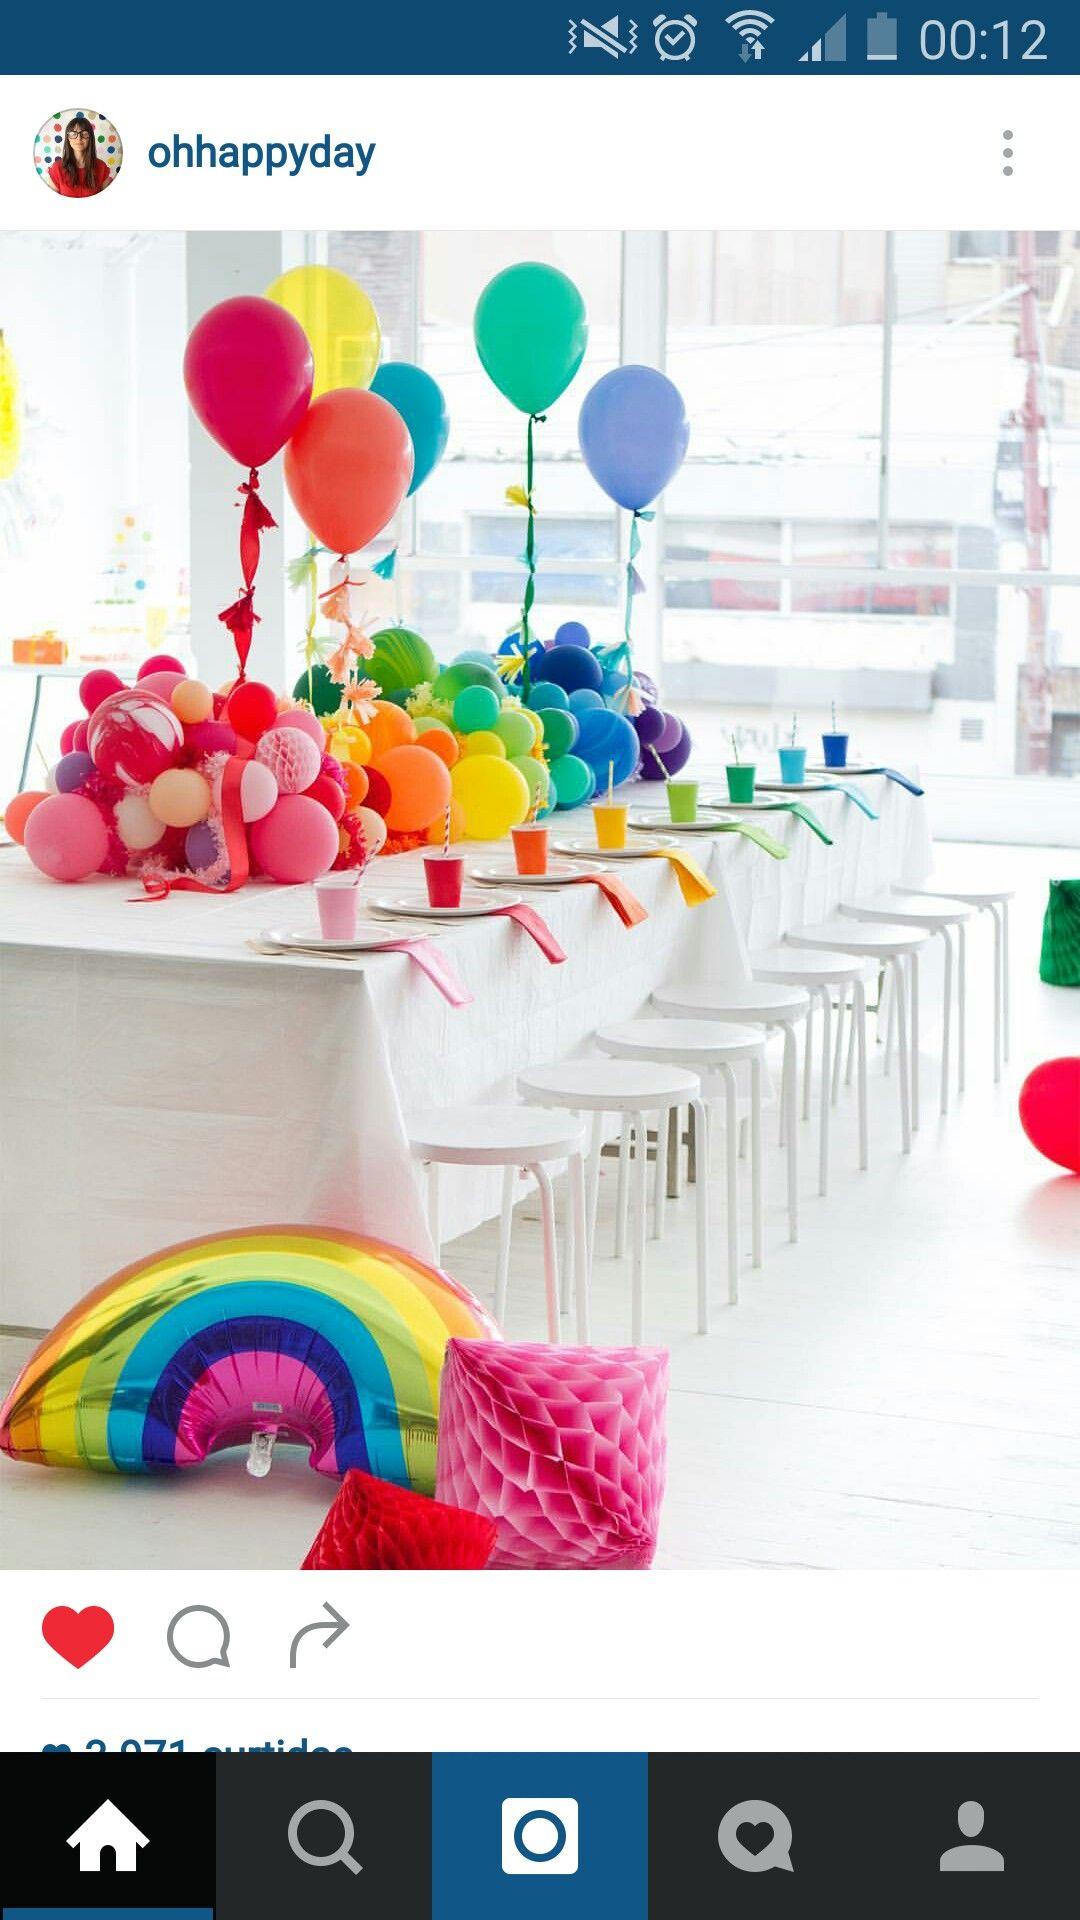 Pin by Nathalie Authier on Bday ideas Pinterest Birthdays